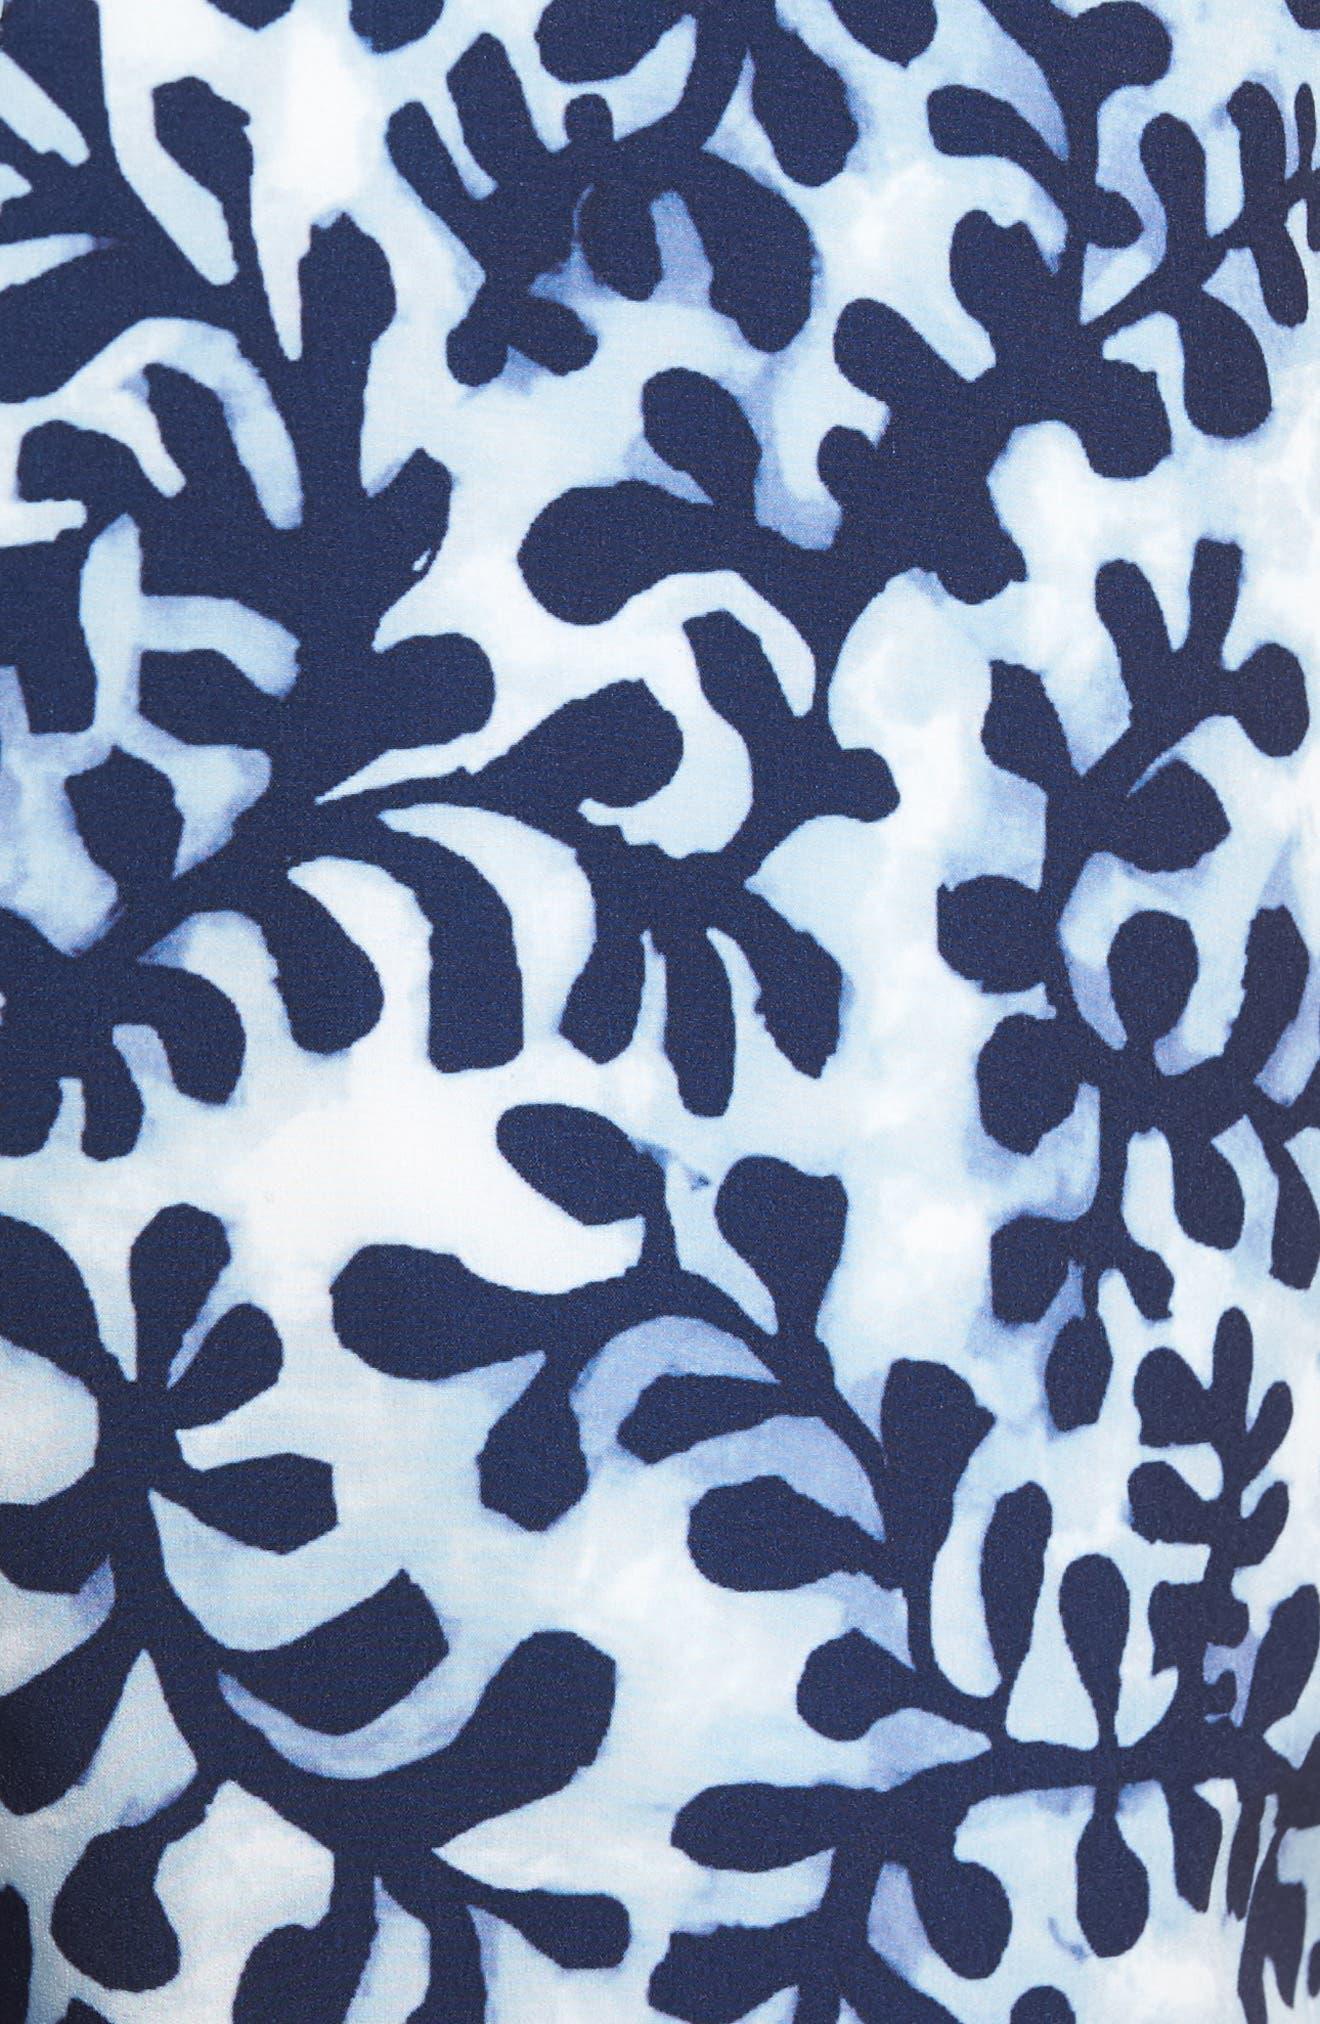 Seaweed Board Shorts,                             Alternate thumbnail 5, color,                             463